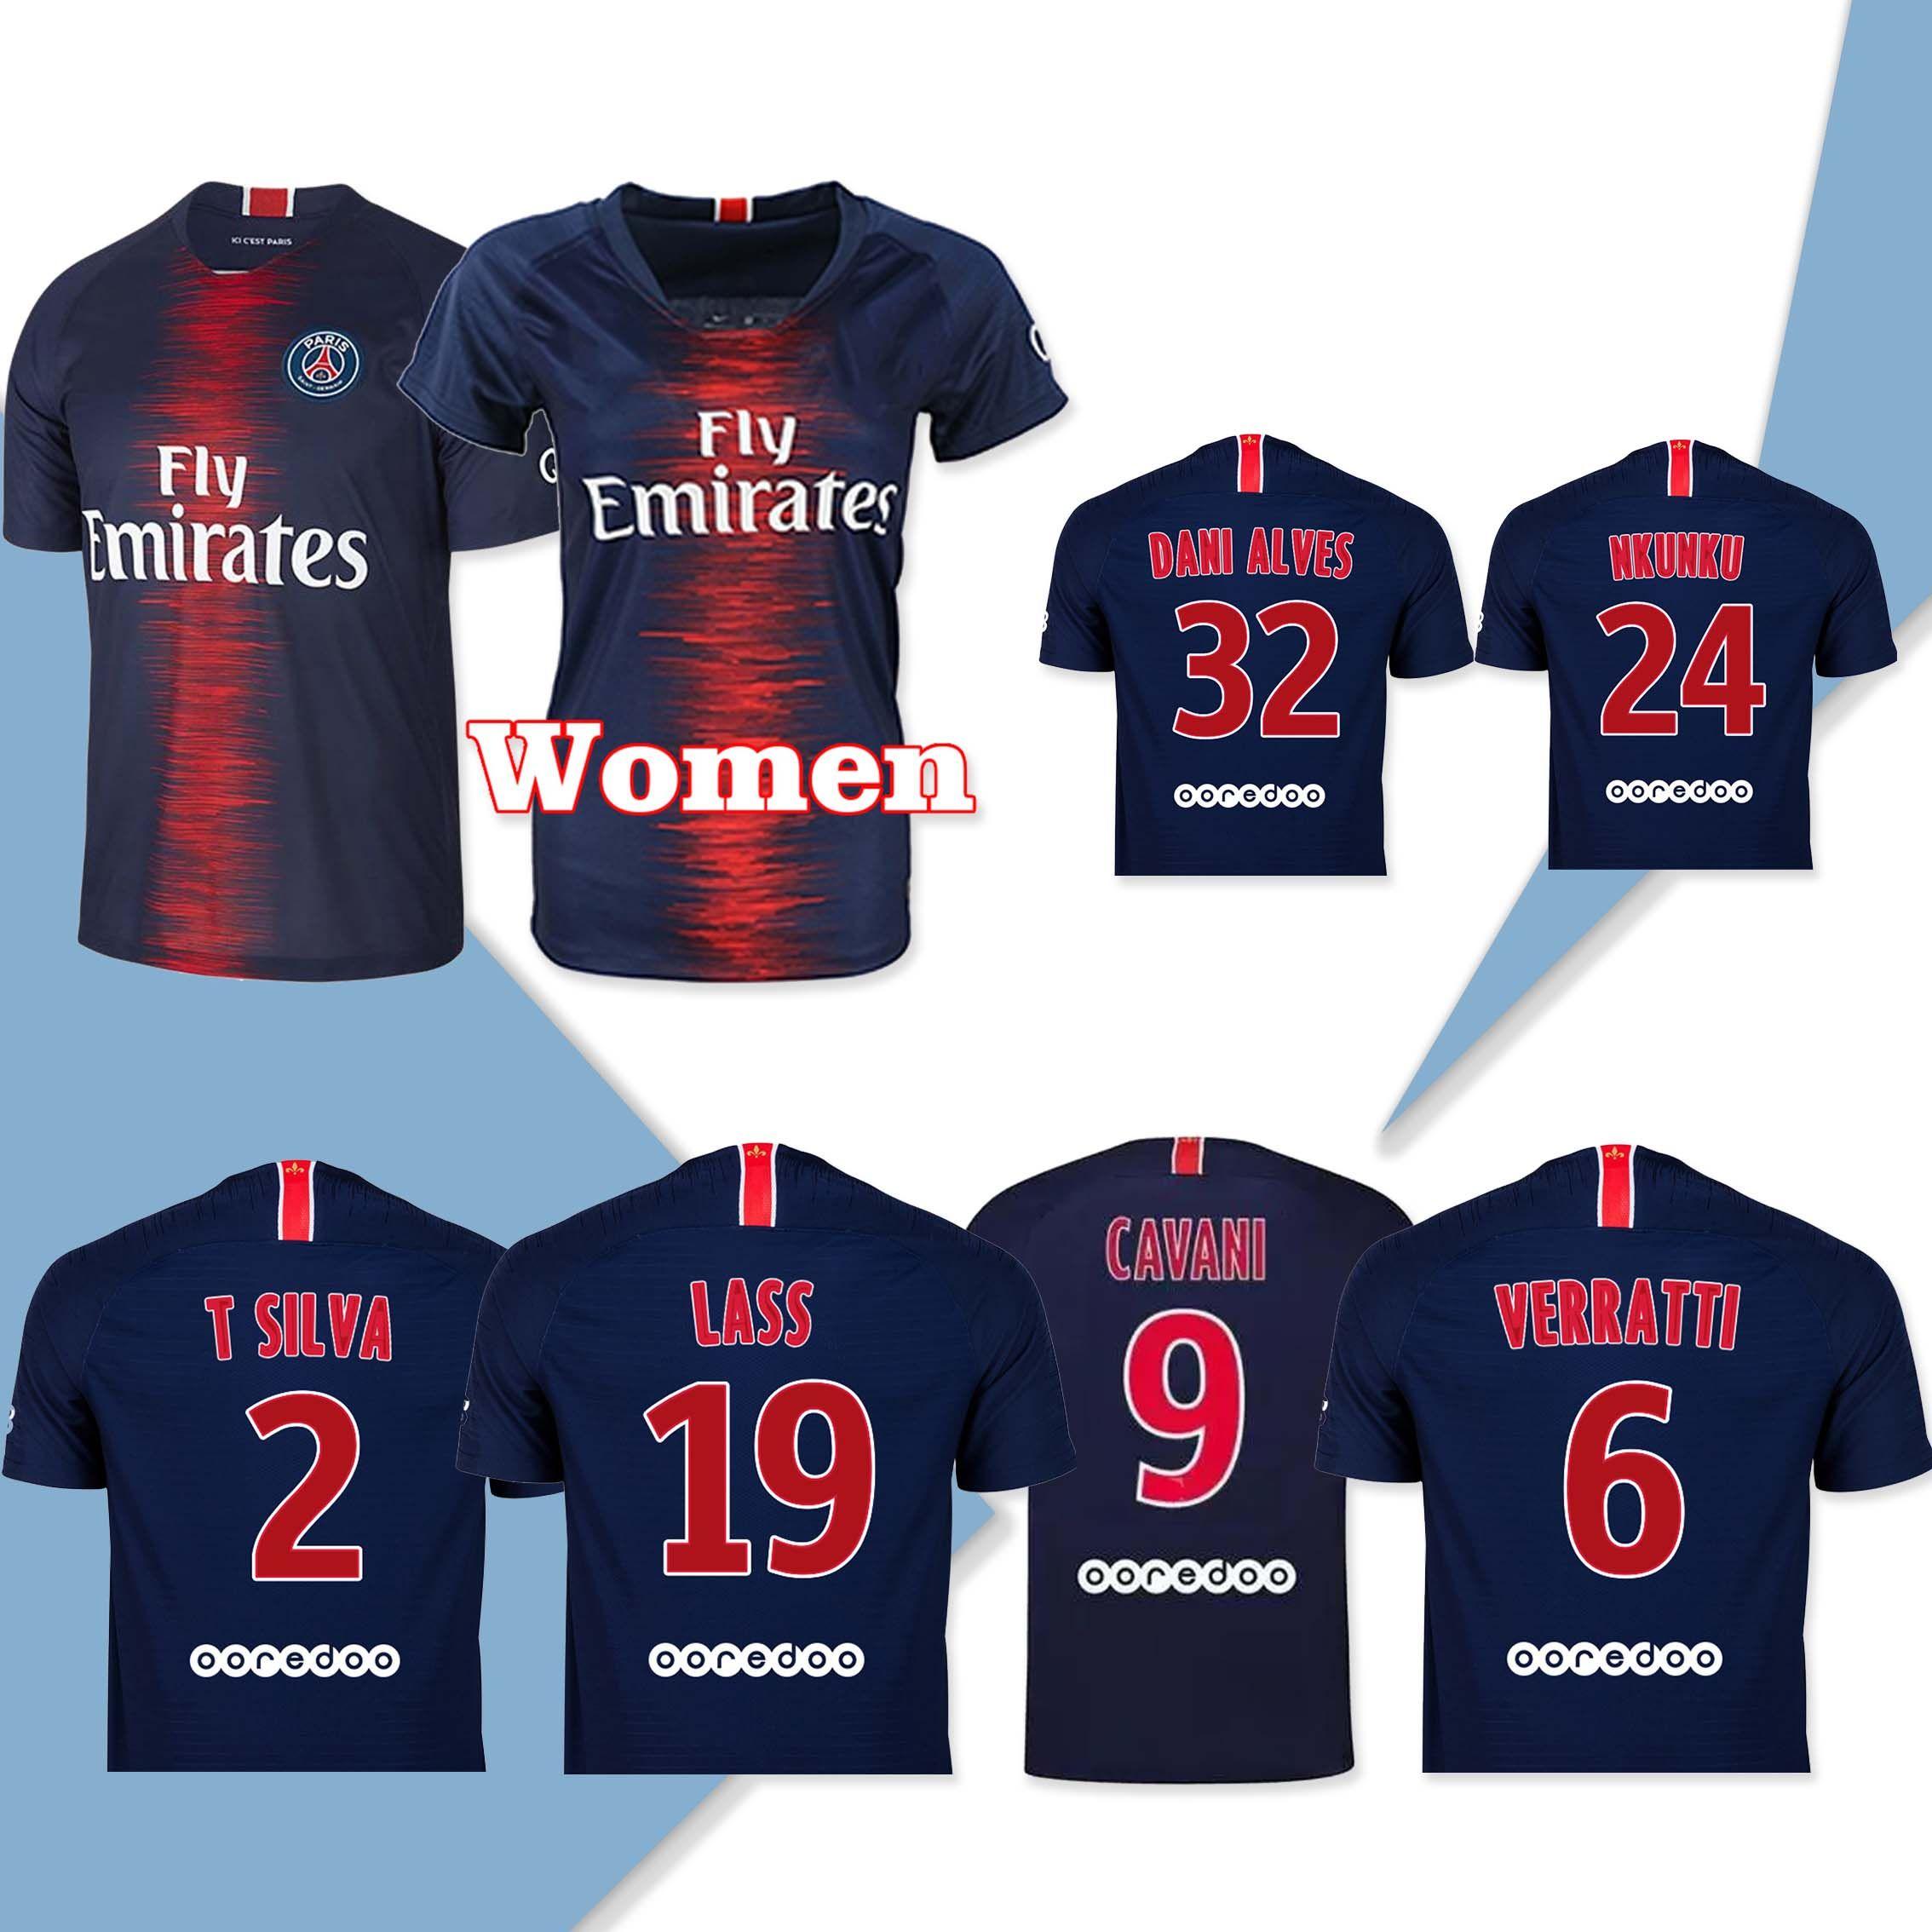 1b2fa1f6d9c86 2019 18 19 Player Version PSG  6 VERRATTI Home Soccer Jersey 2019 Paris  Saint Germain Home Soccer Shirt  9 Cavani  7 MBAPPE Football Uniform From  ...